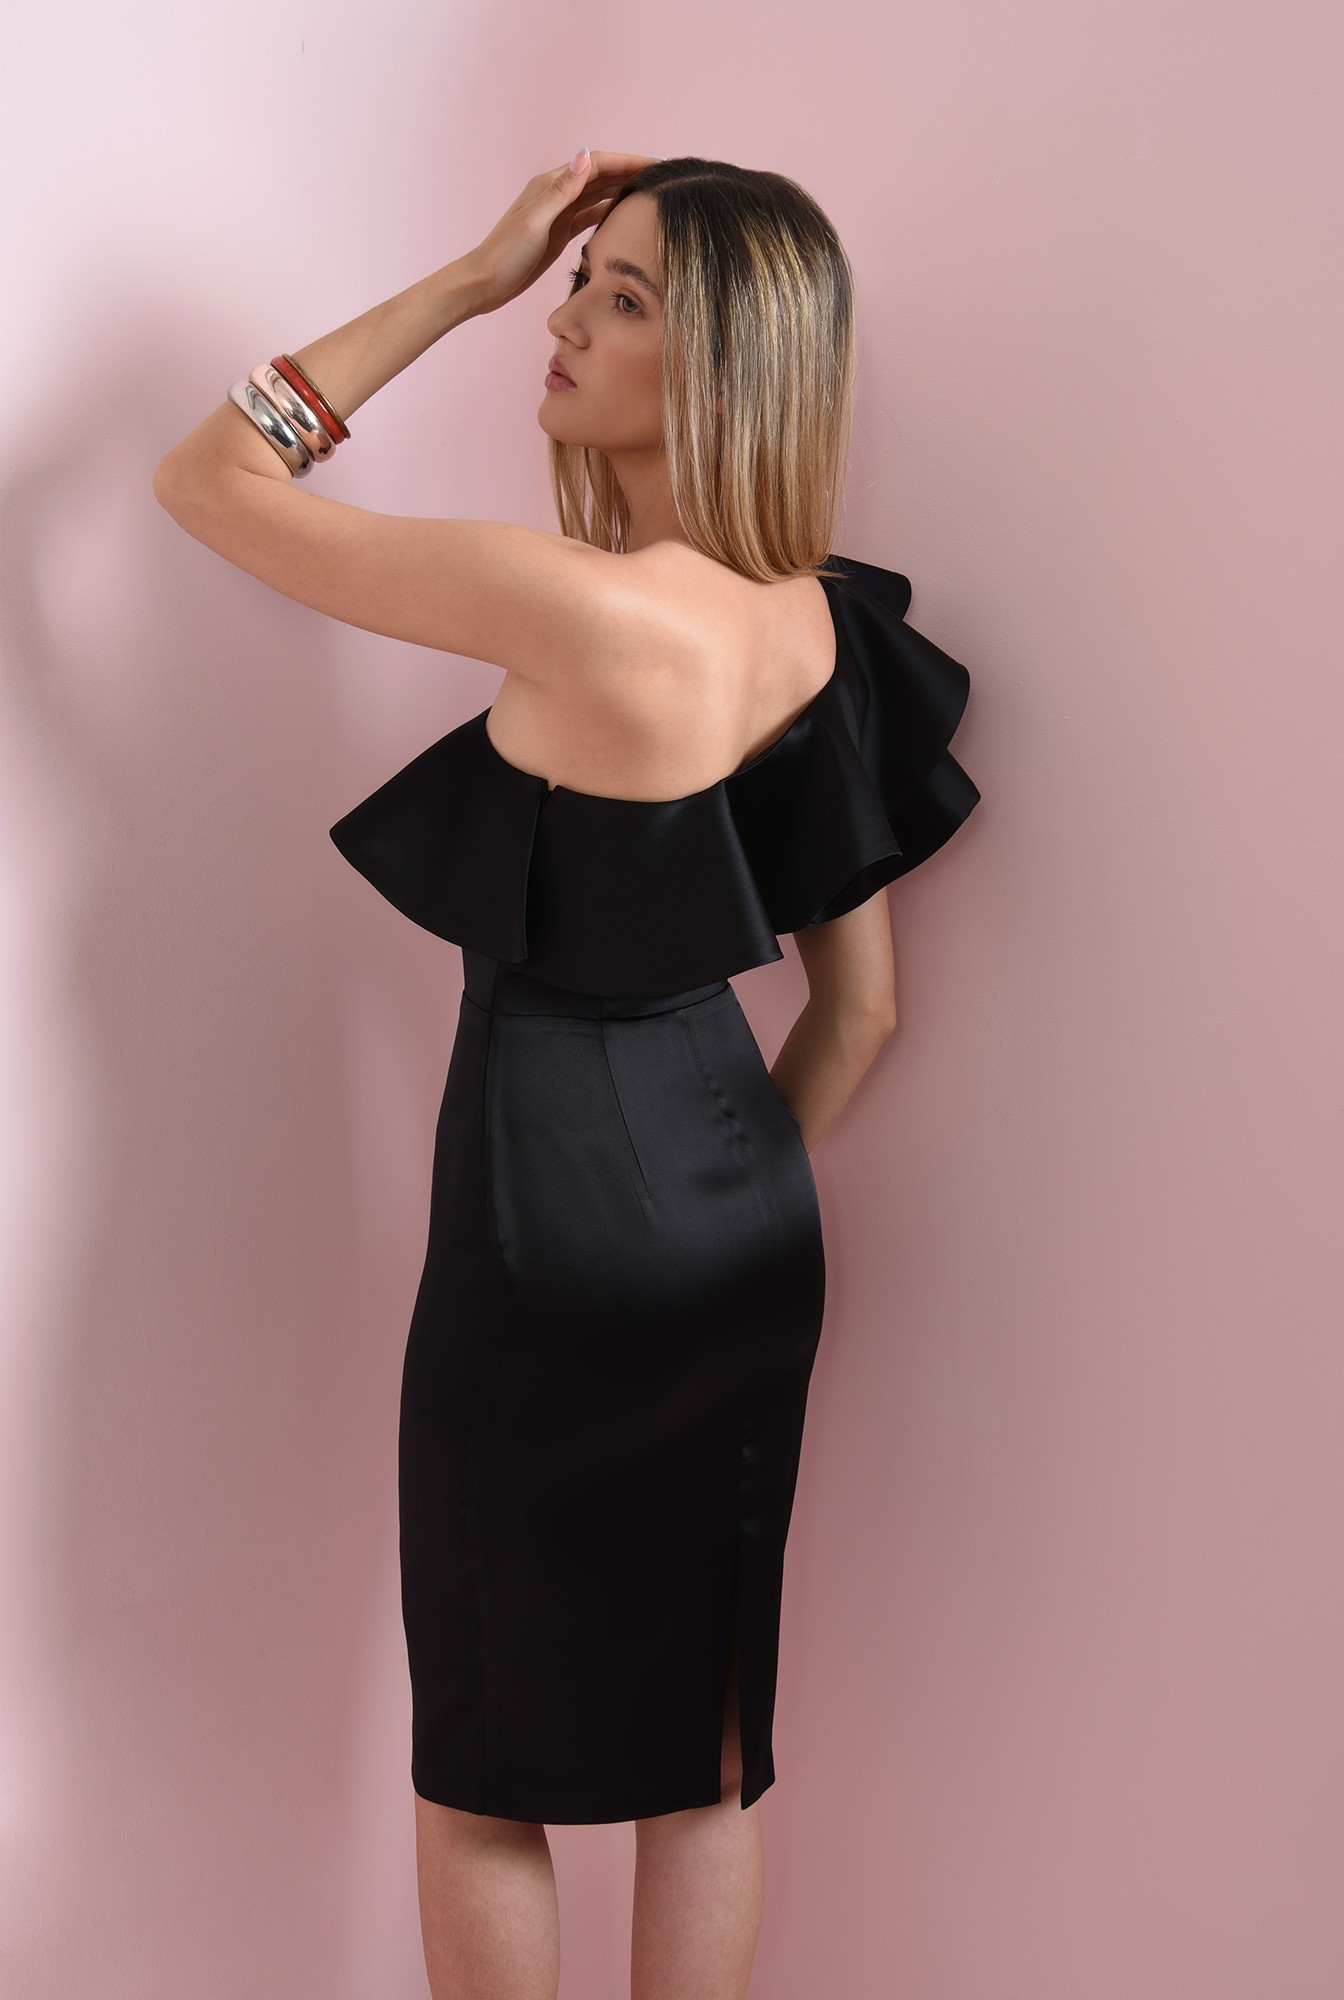 0 - rochie eleganta, conica, Poema